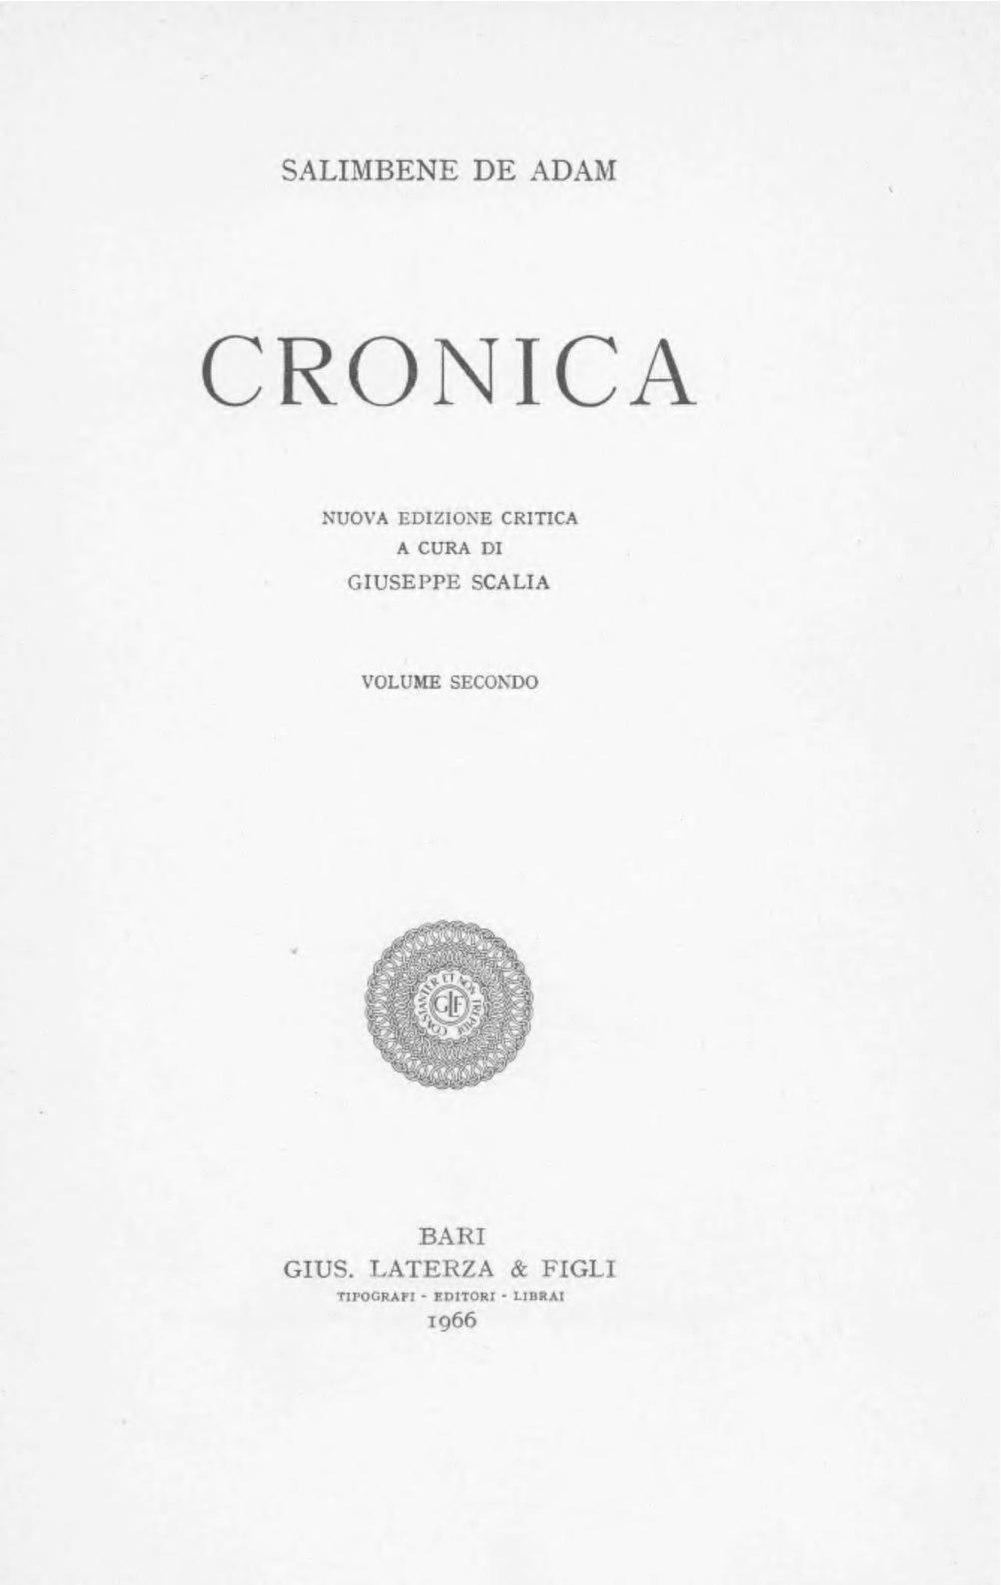 Filesalimbene De Adam Cronica Vol Ii 1966 Beic 1913630pdf Original File Svg Nominally 573 X 444 Pixels Size 1586